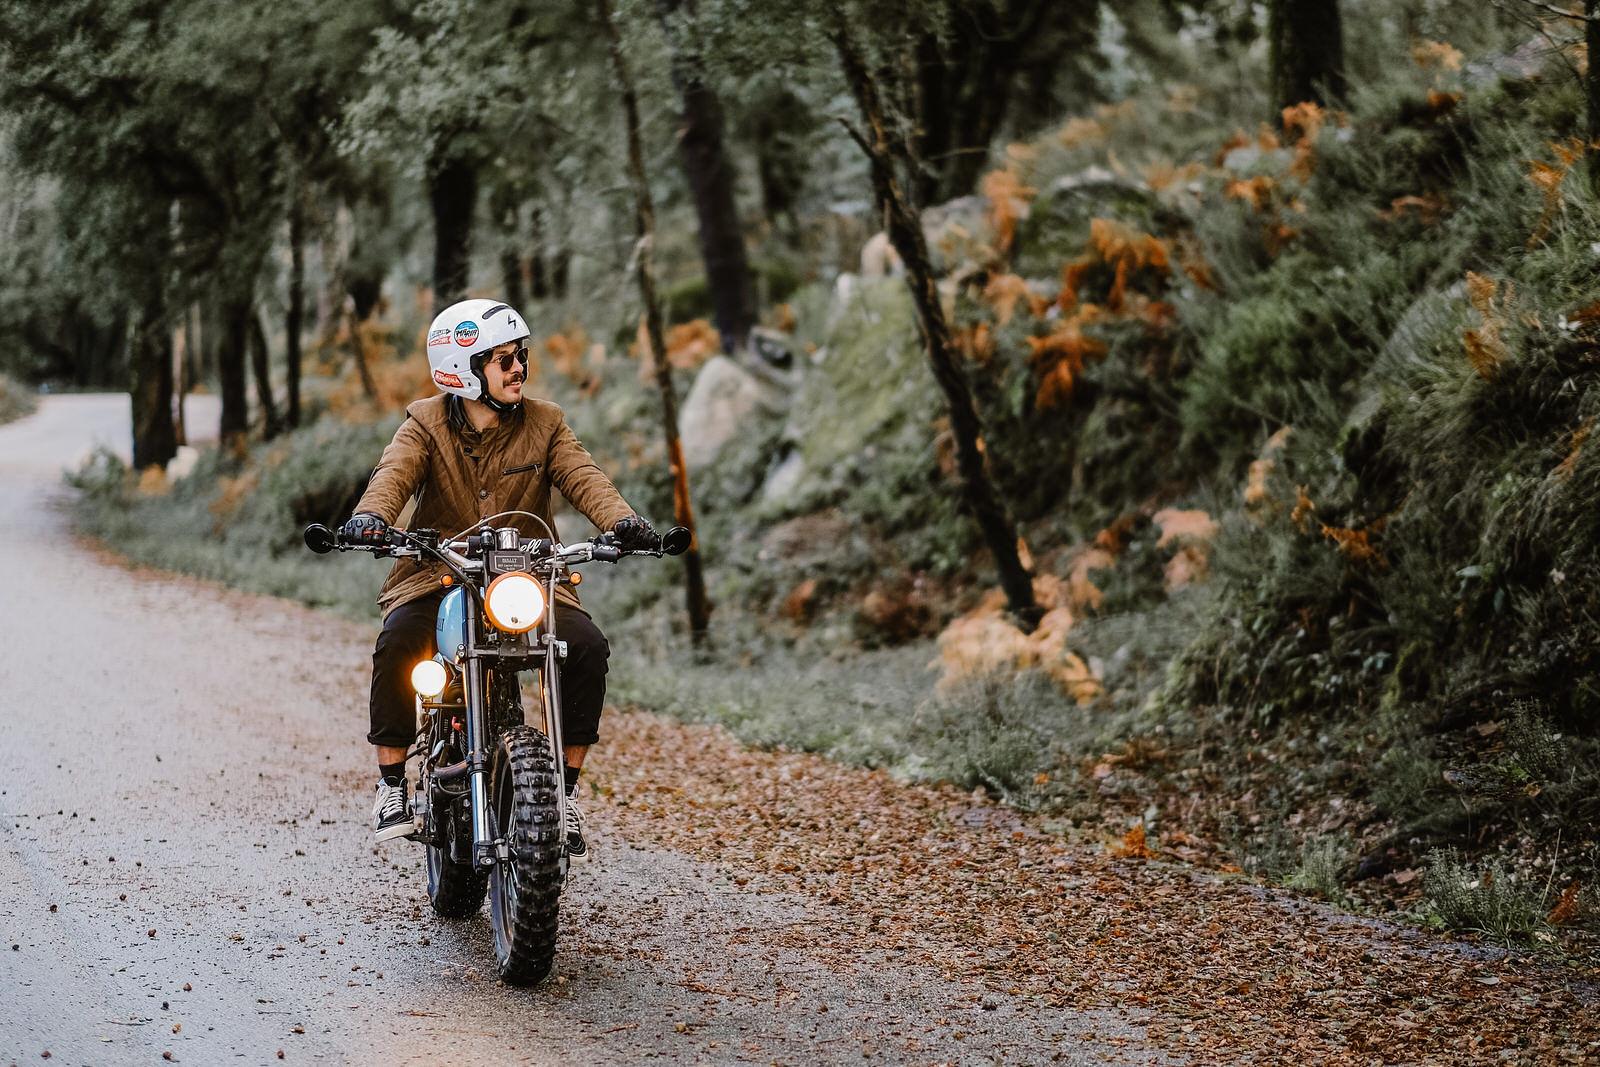 Gentlemans Ride, Bullit, Mash, Brixton, scrambler, caferacer, fuel motorcycles. Porto - Portugal